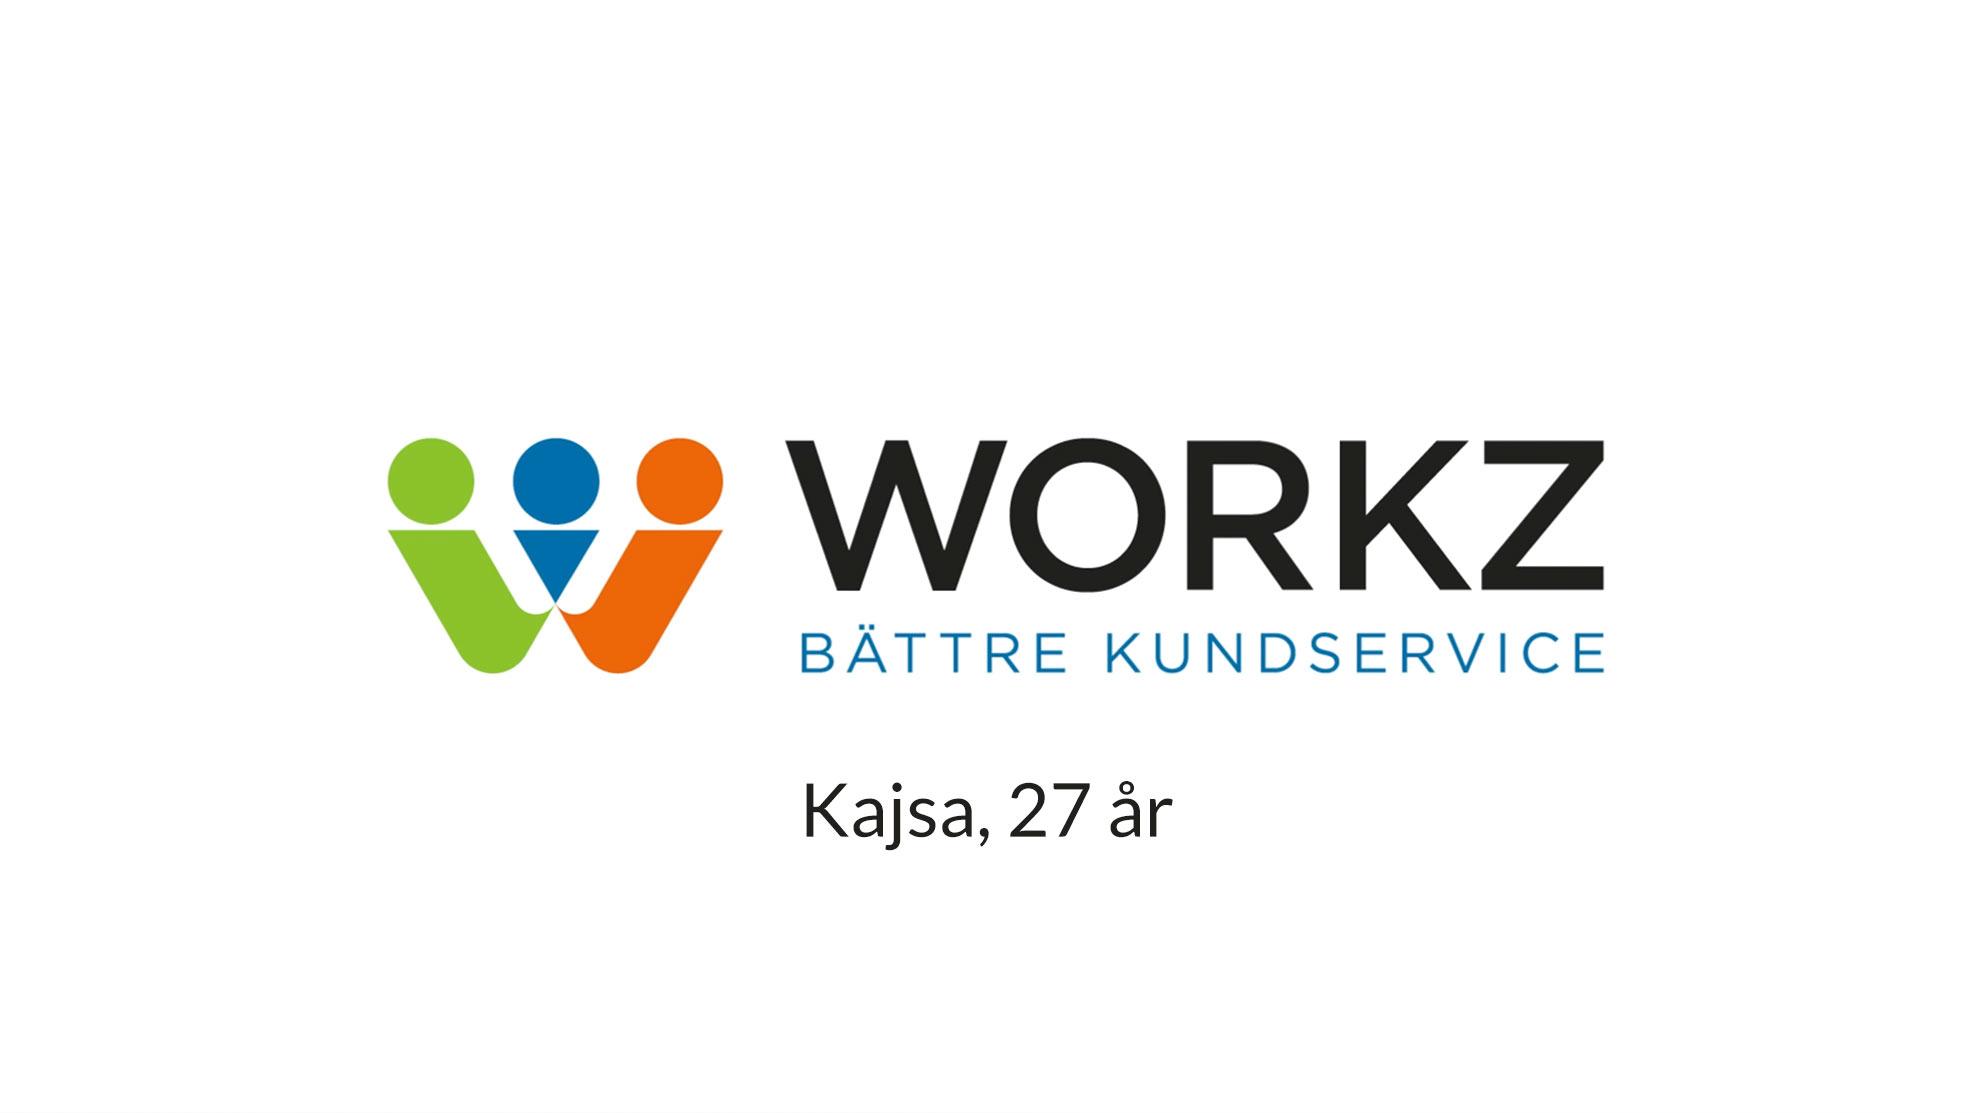 workz-kajsa-subtitles